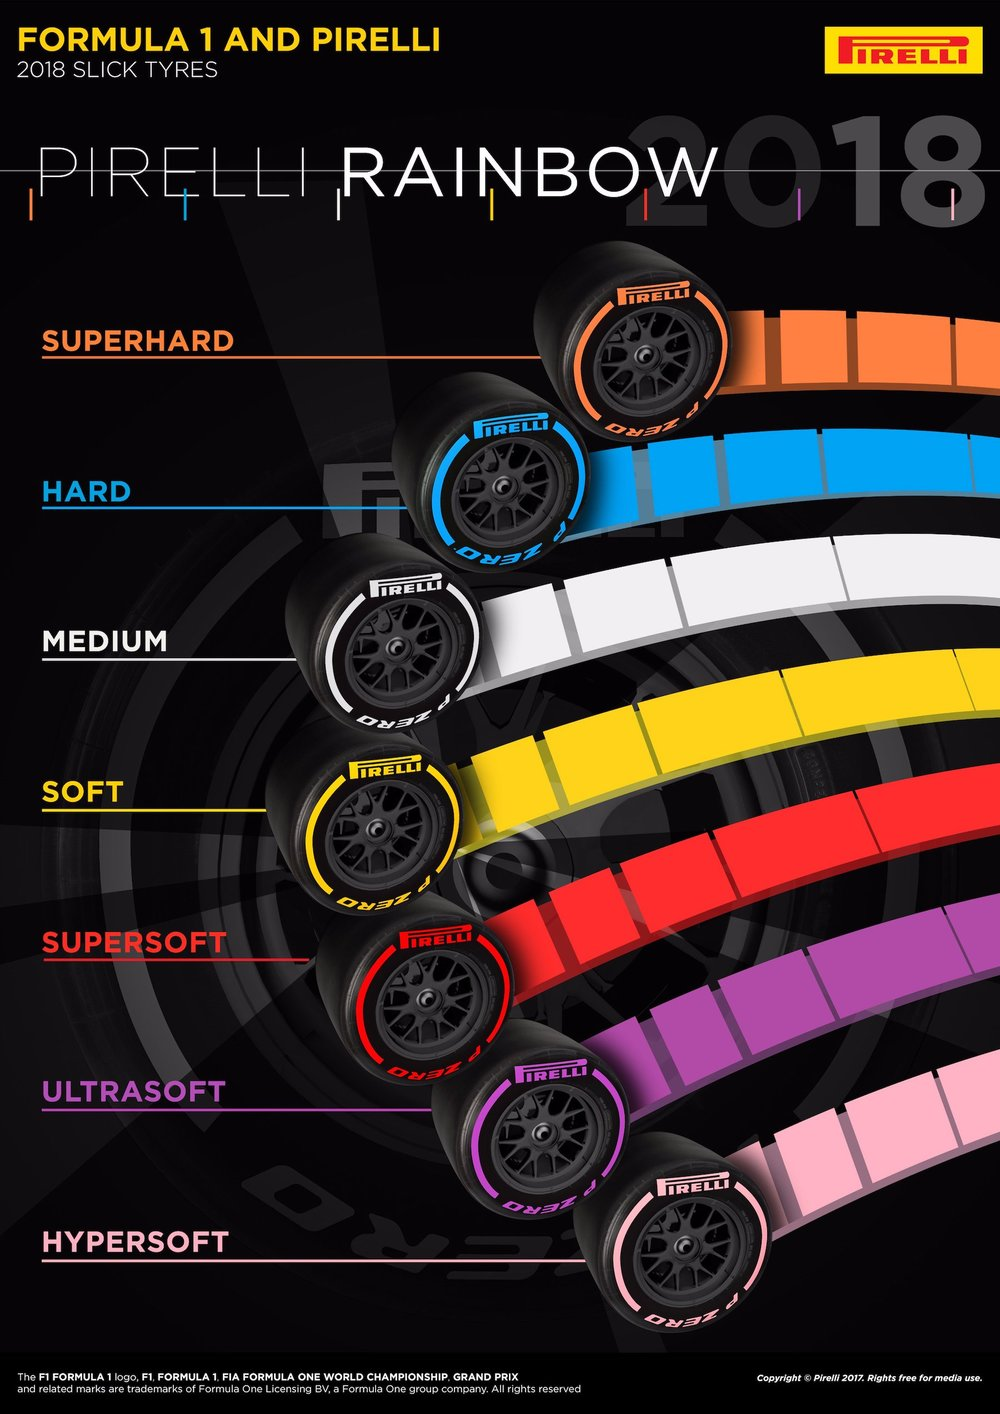 2018 Pirelli rainbow copy.jpeg